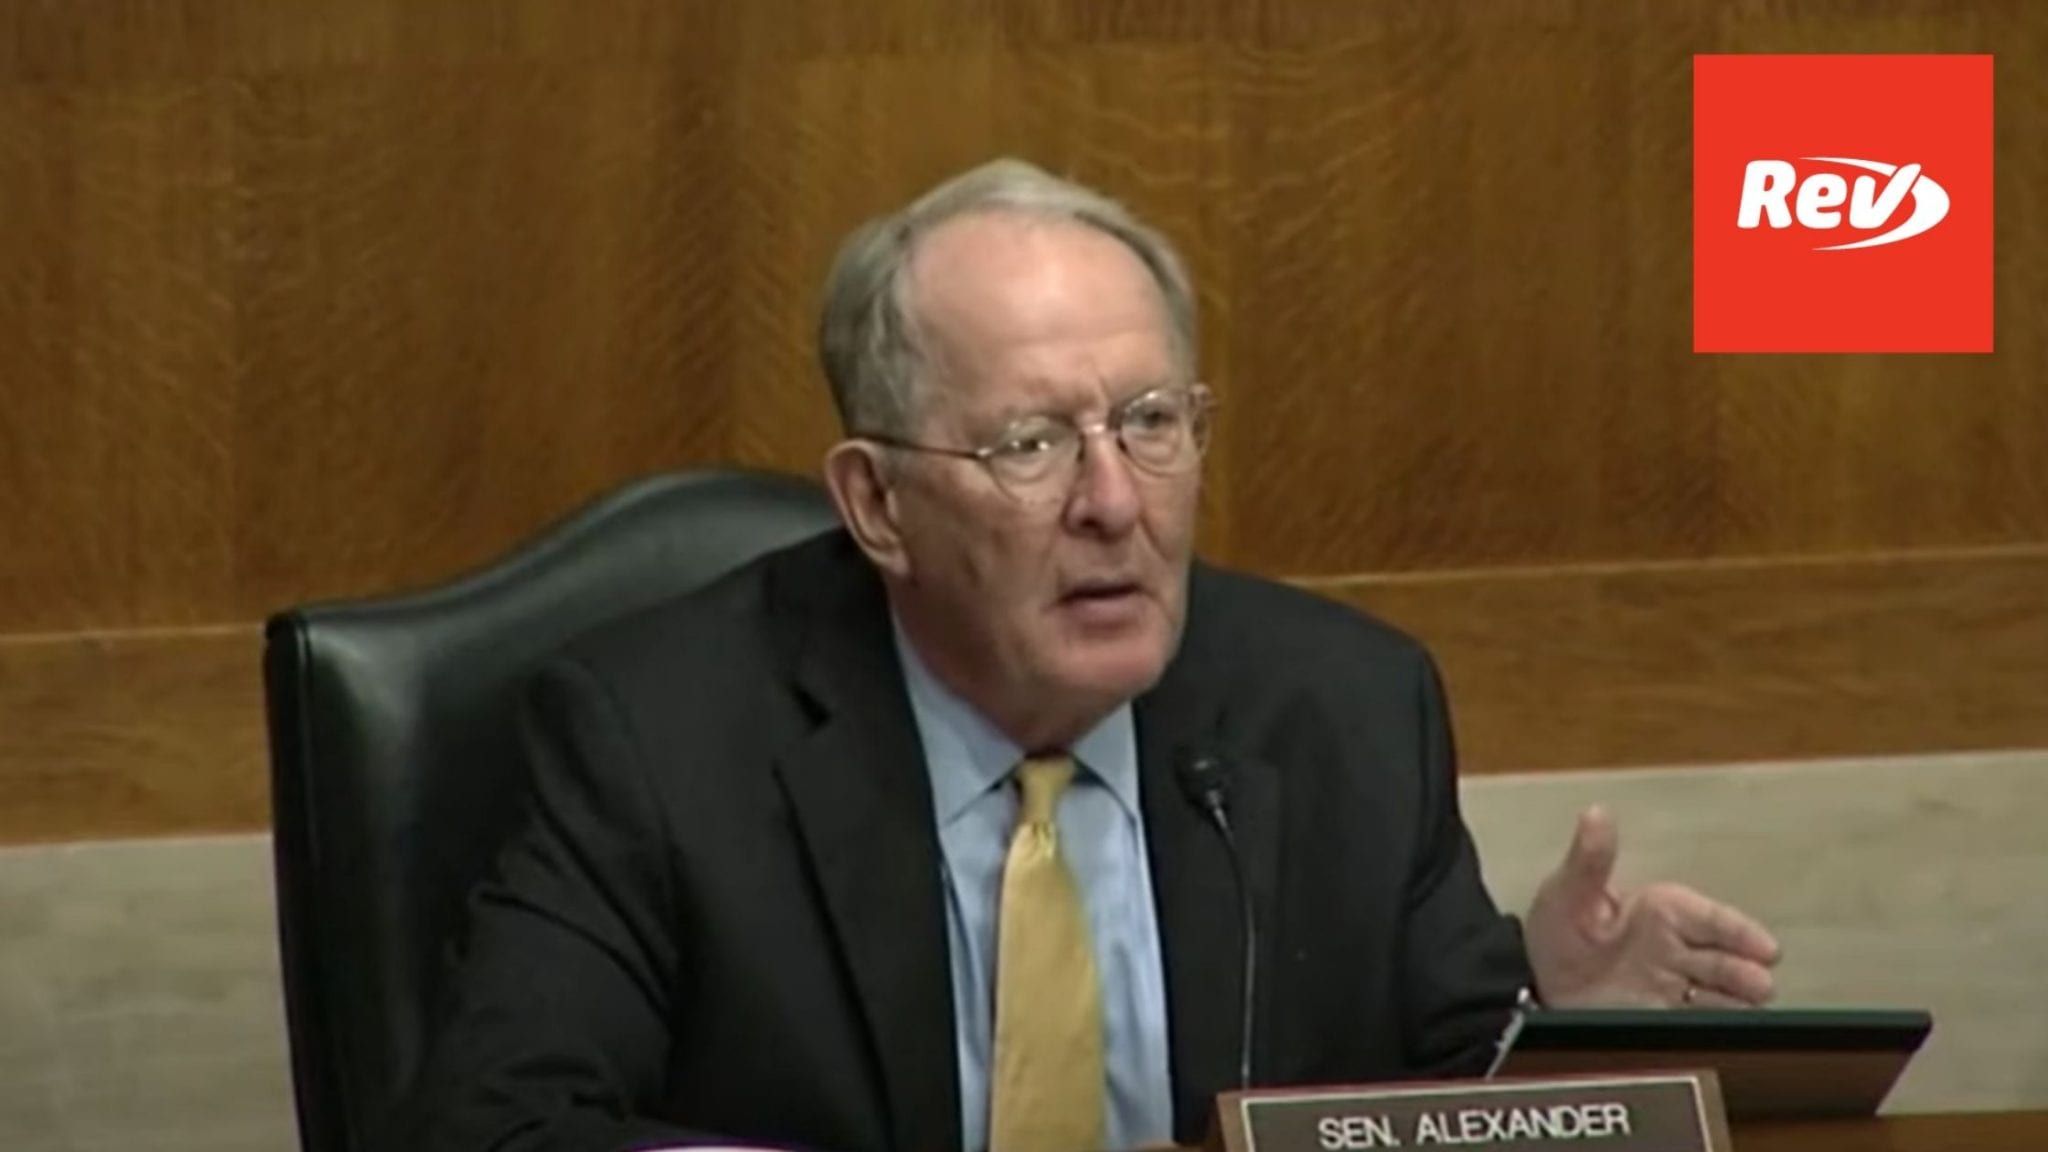 Senate Hearing on COVID-19 Vaccine Development Transcript September 9